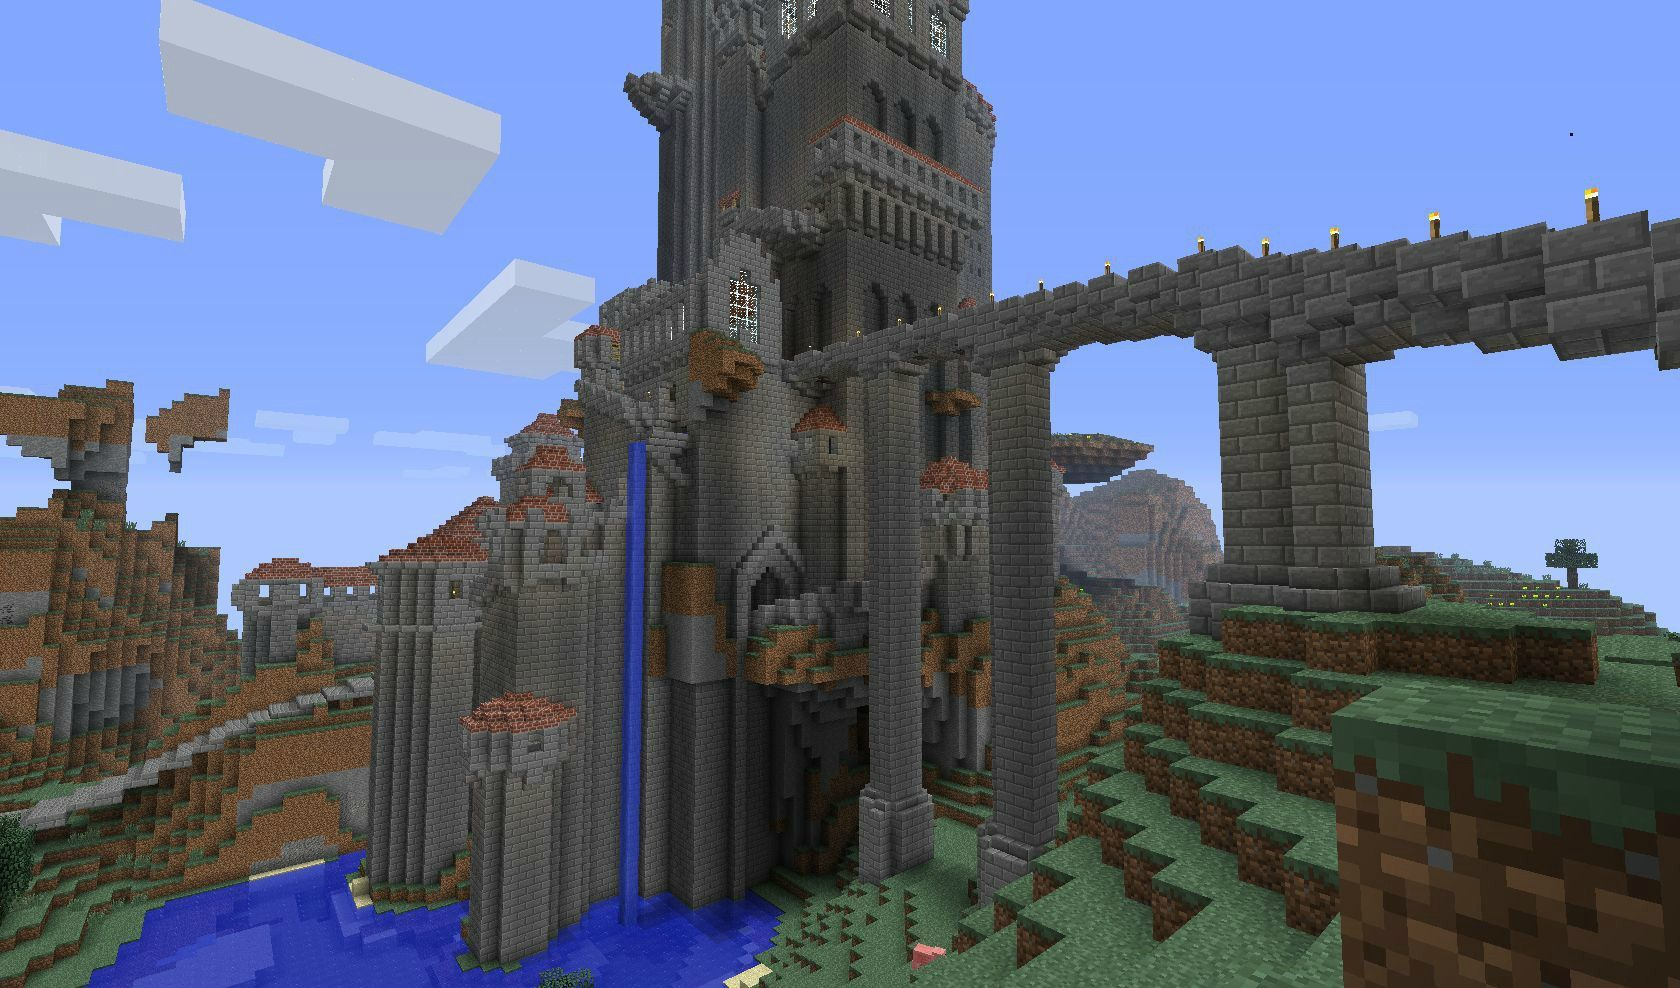 minecraft castle interior decorating ideas | Castle Design ...